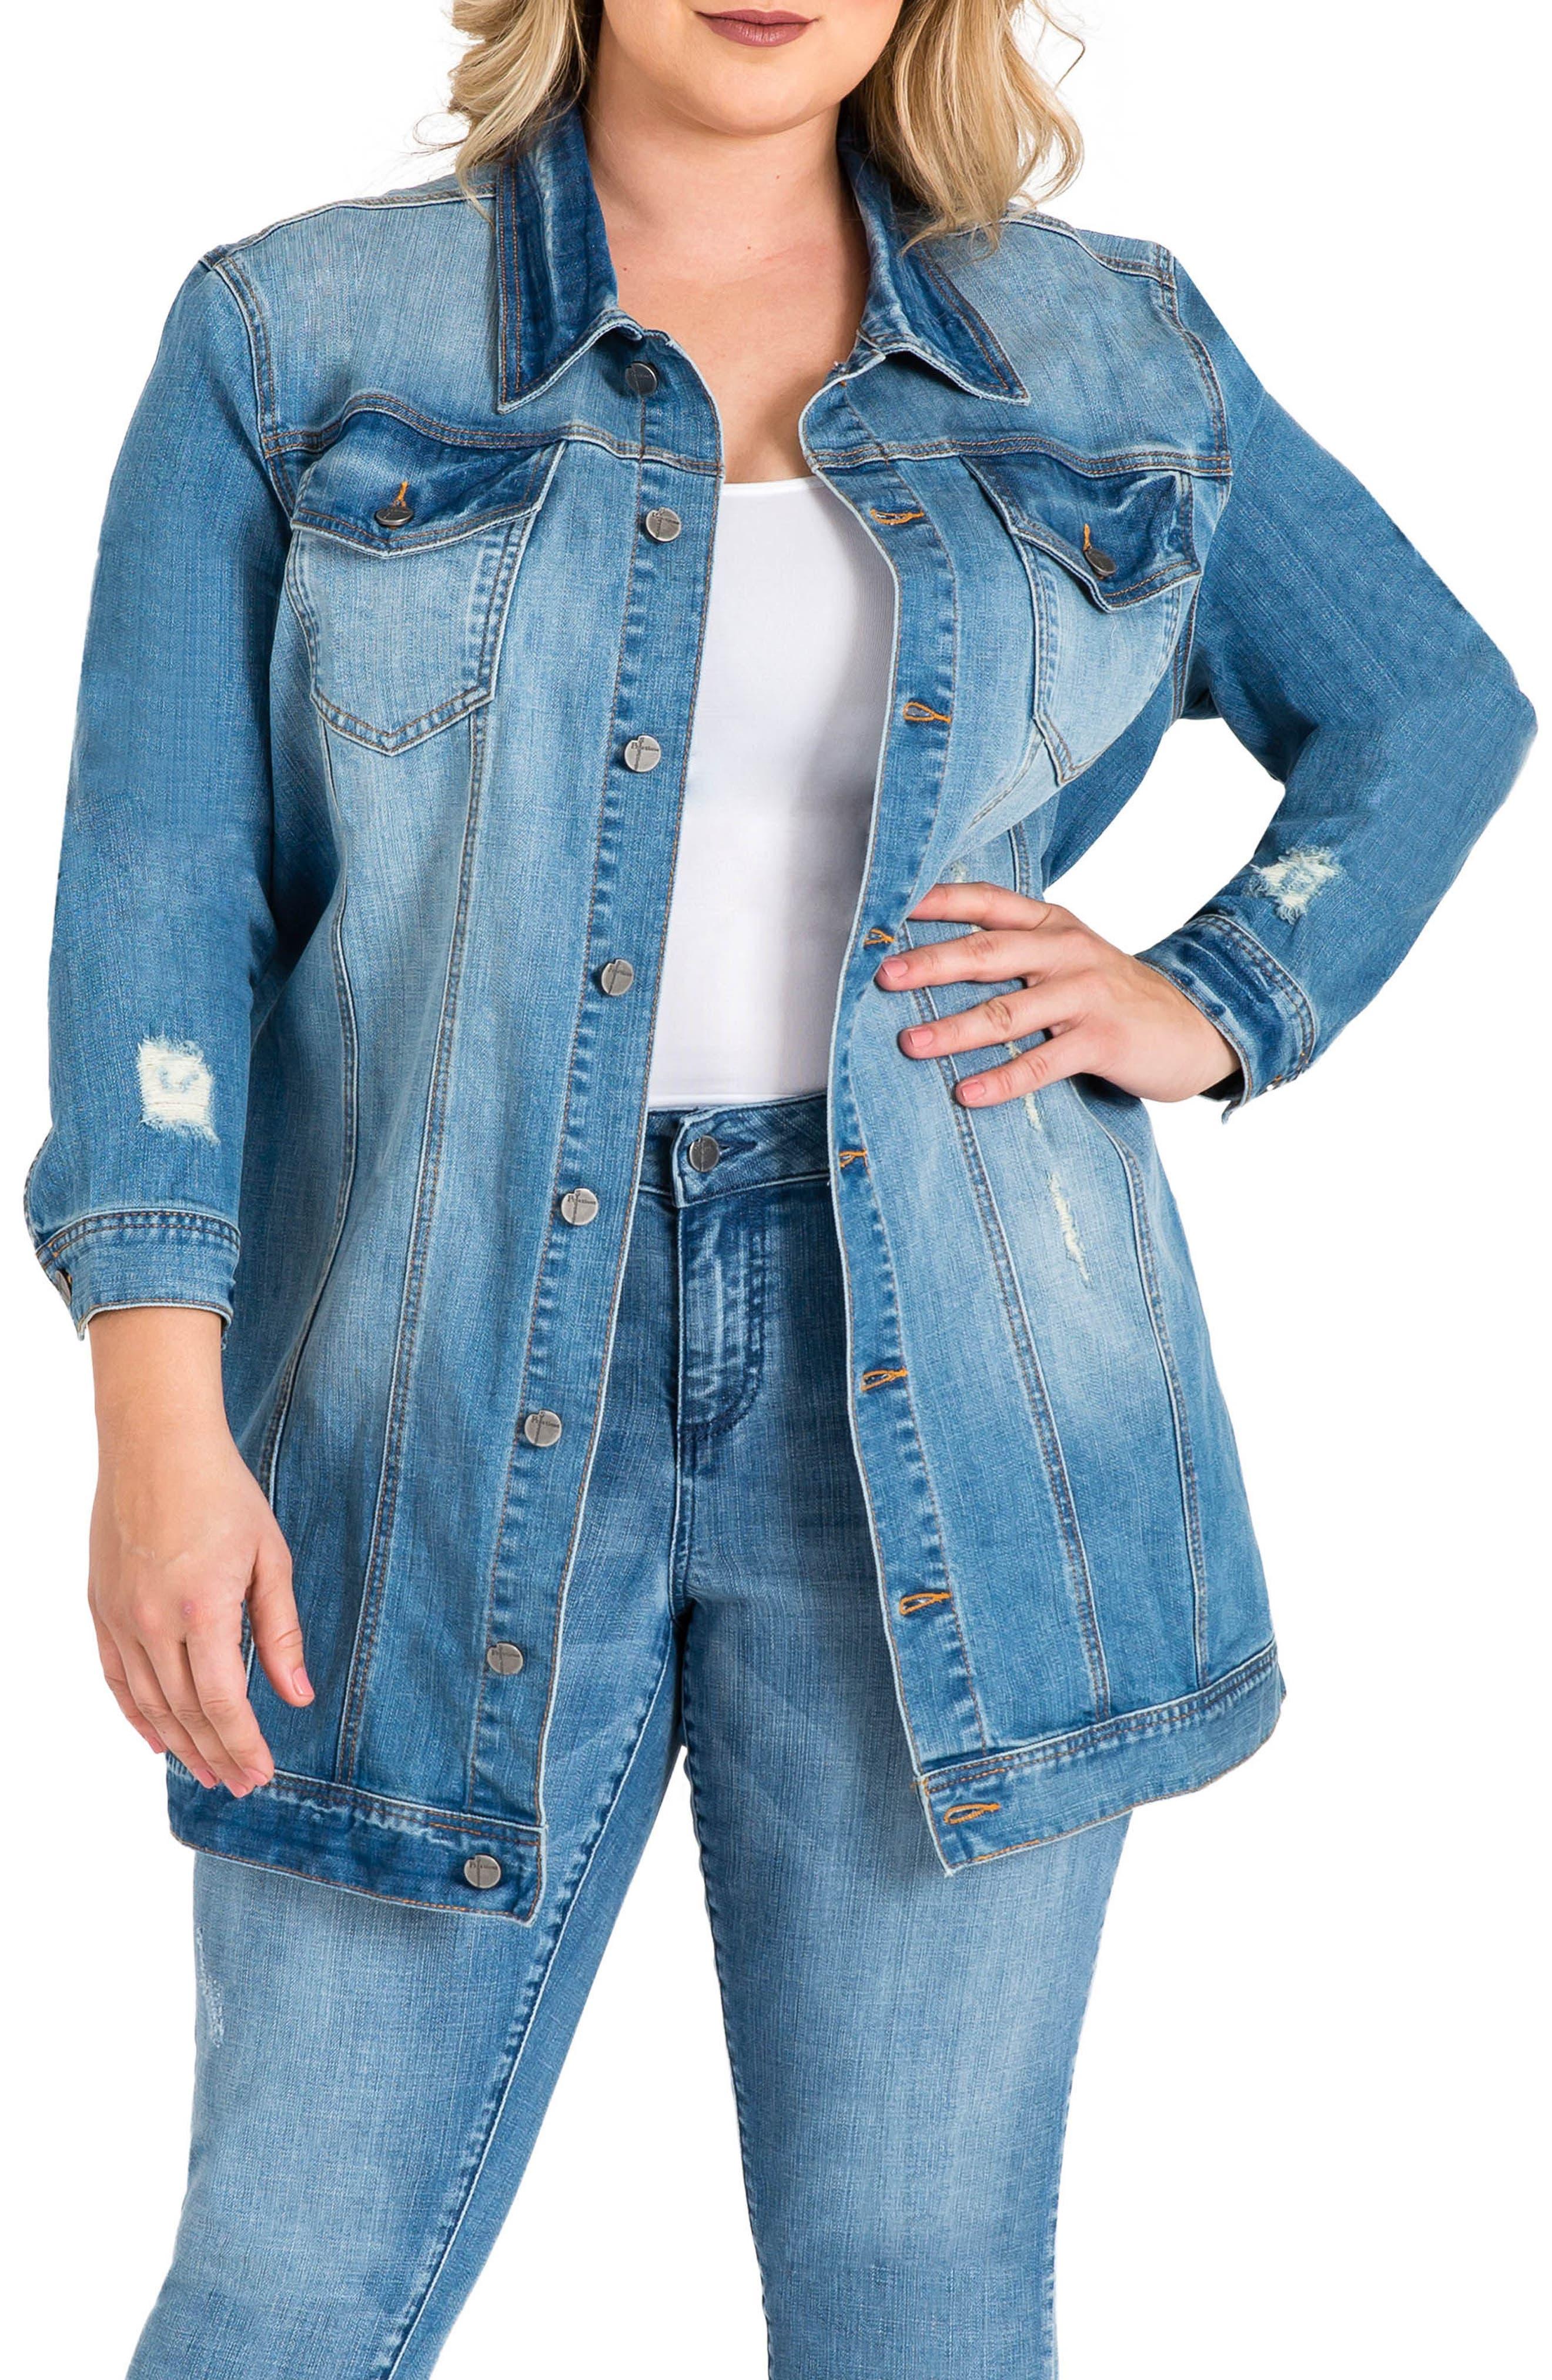 STANDARDS & PRACTICES Margot Longline Denim Jacket, Main, color, LIGHT BLUE